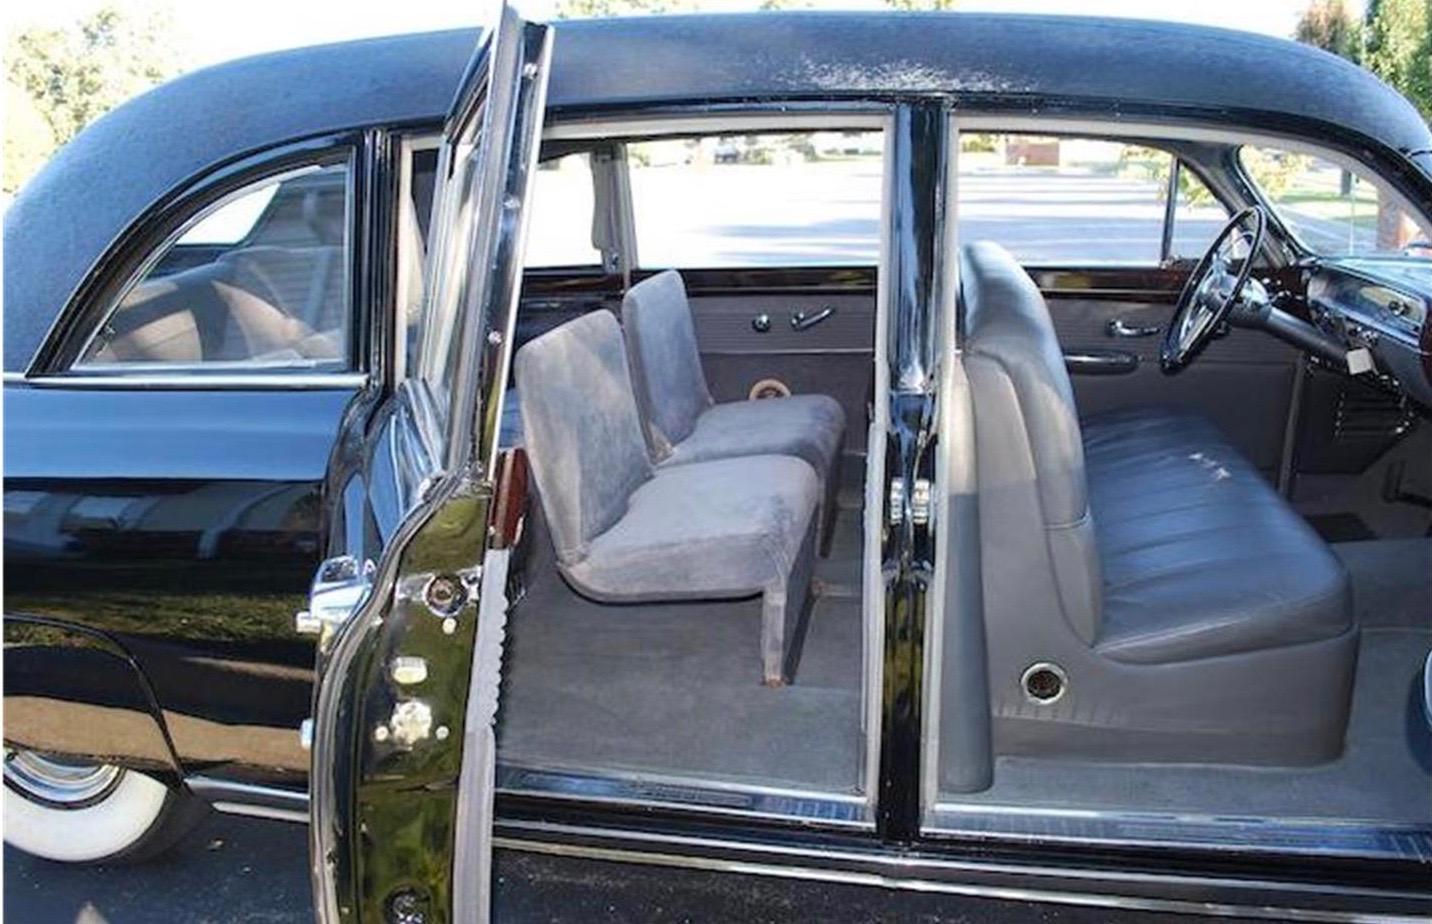 Truman limousine, Harry Truman's 1950 Lincoln limo for sale, ClassicCars.com Journal